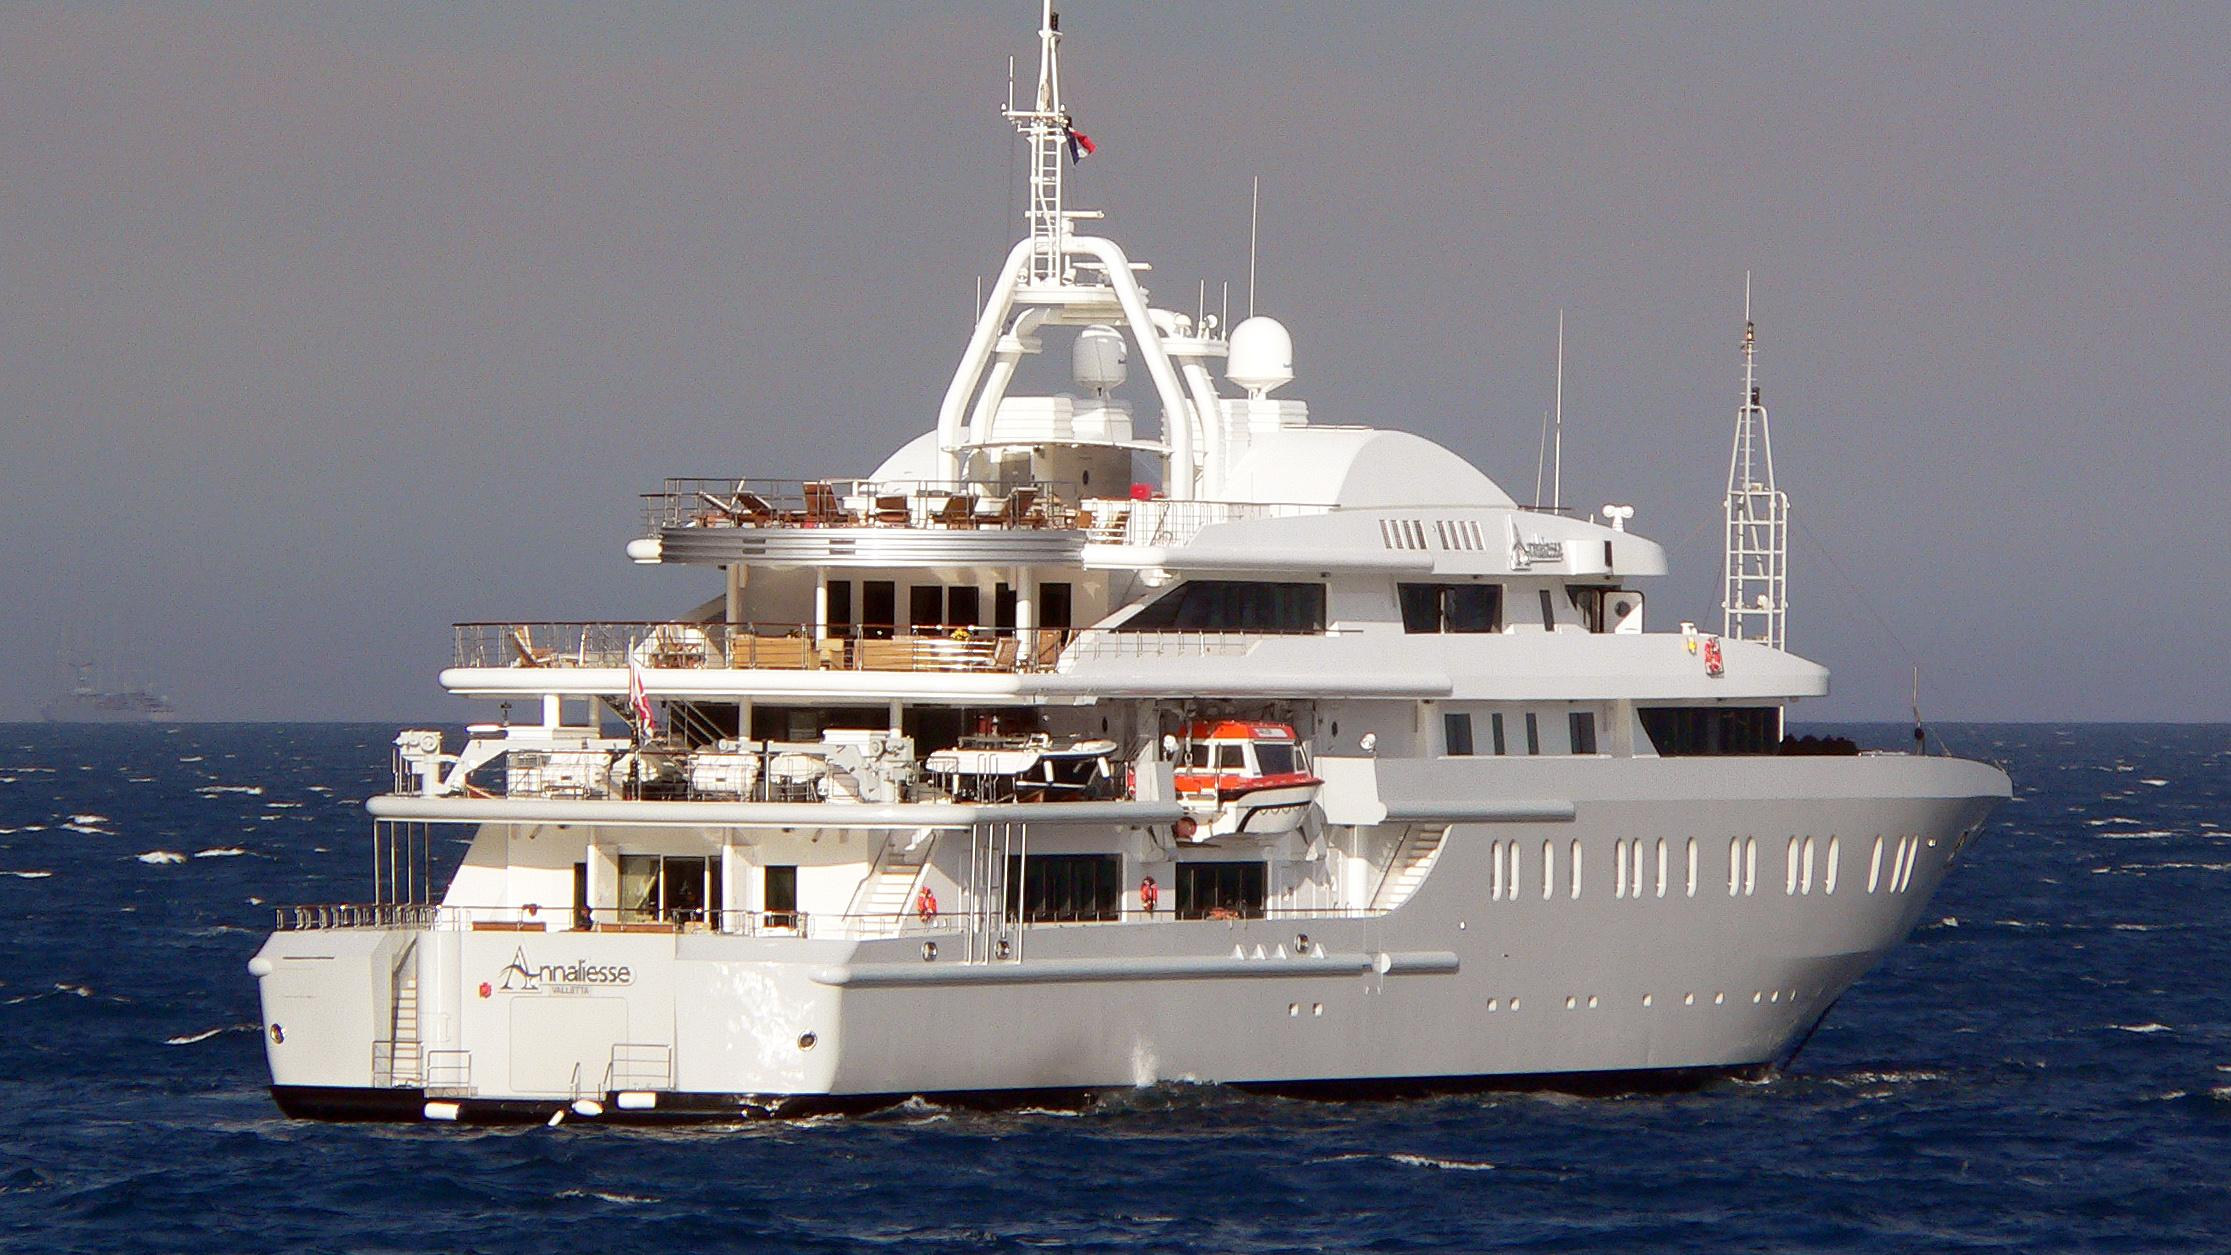 queen-miri-motor-yacht-neorion-2004-91m-stern-before-refit